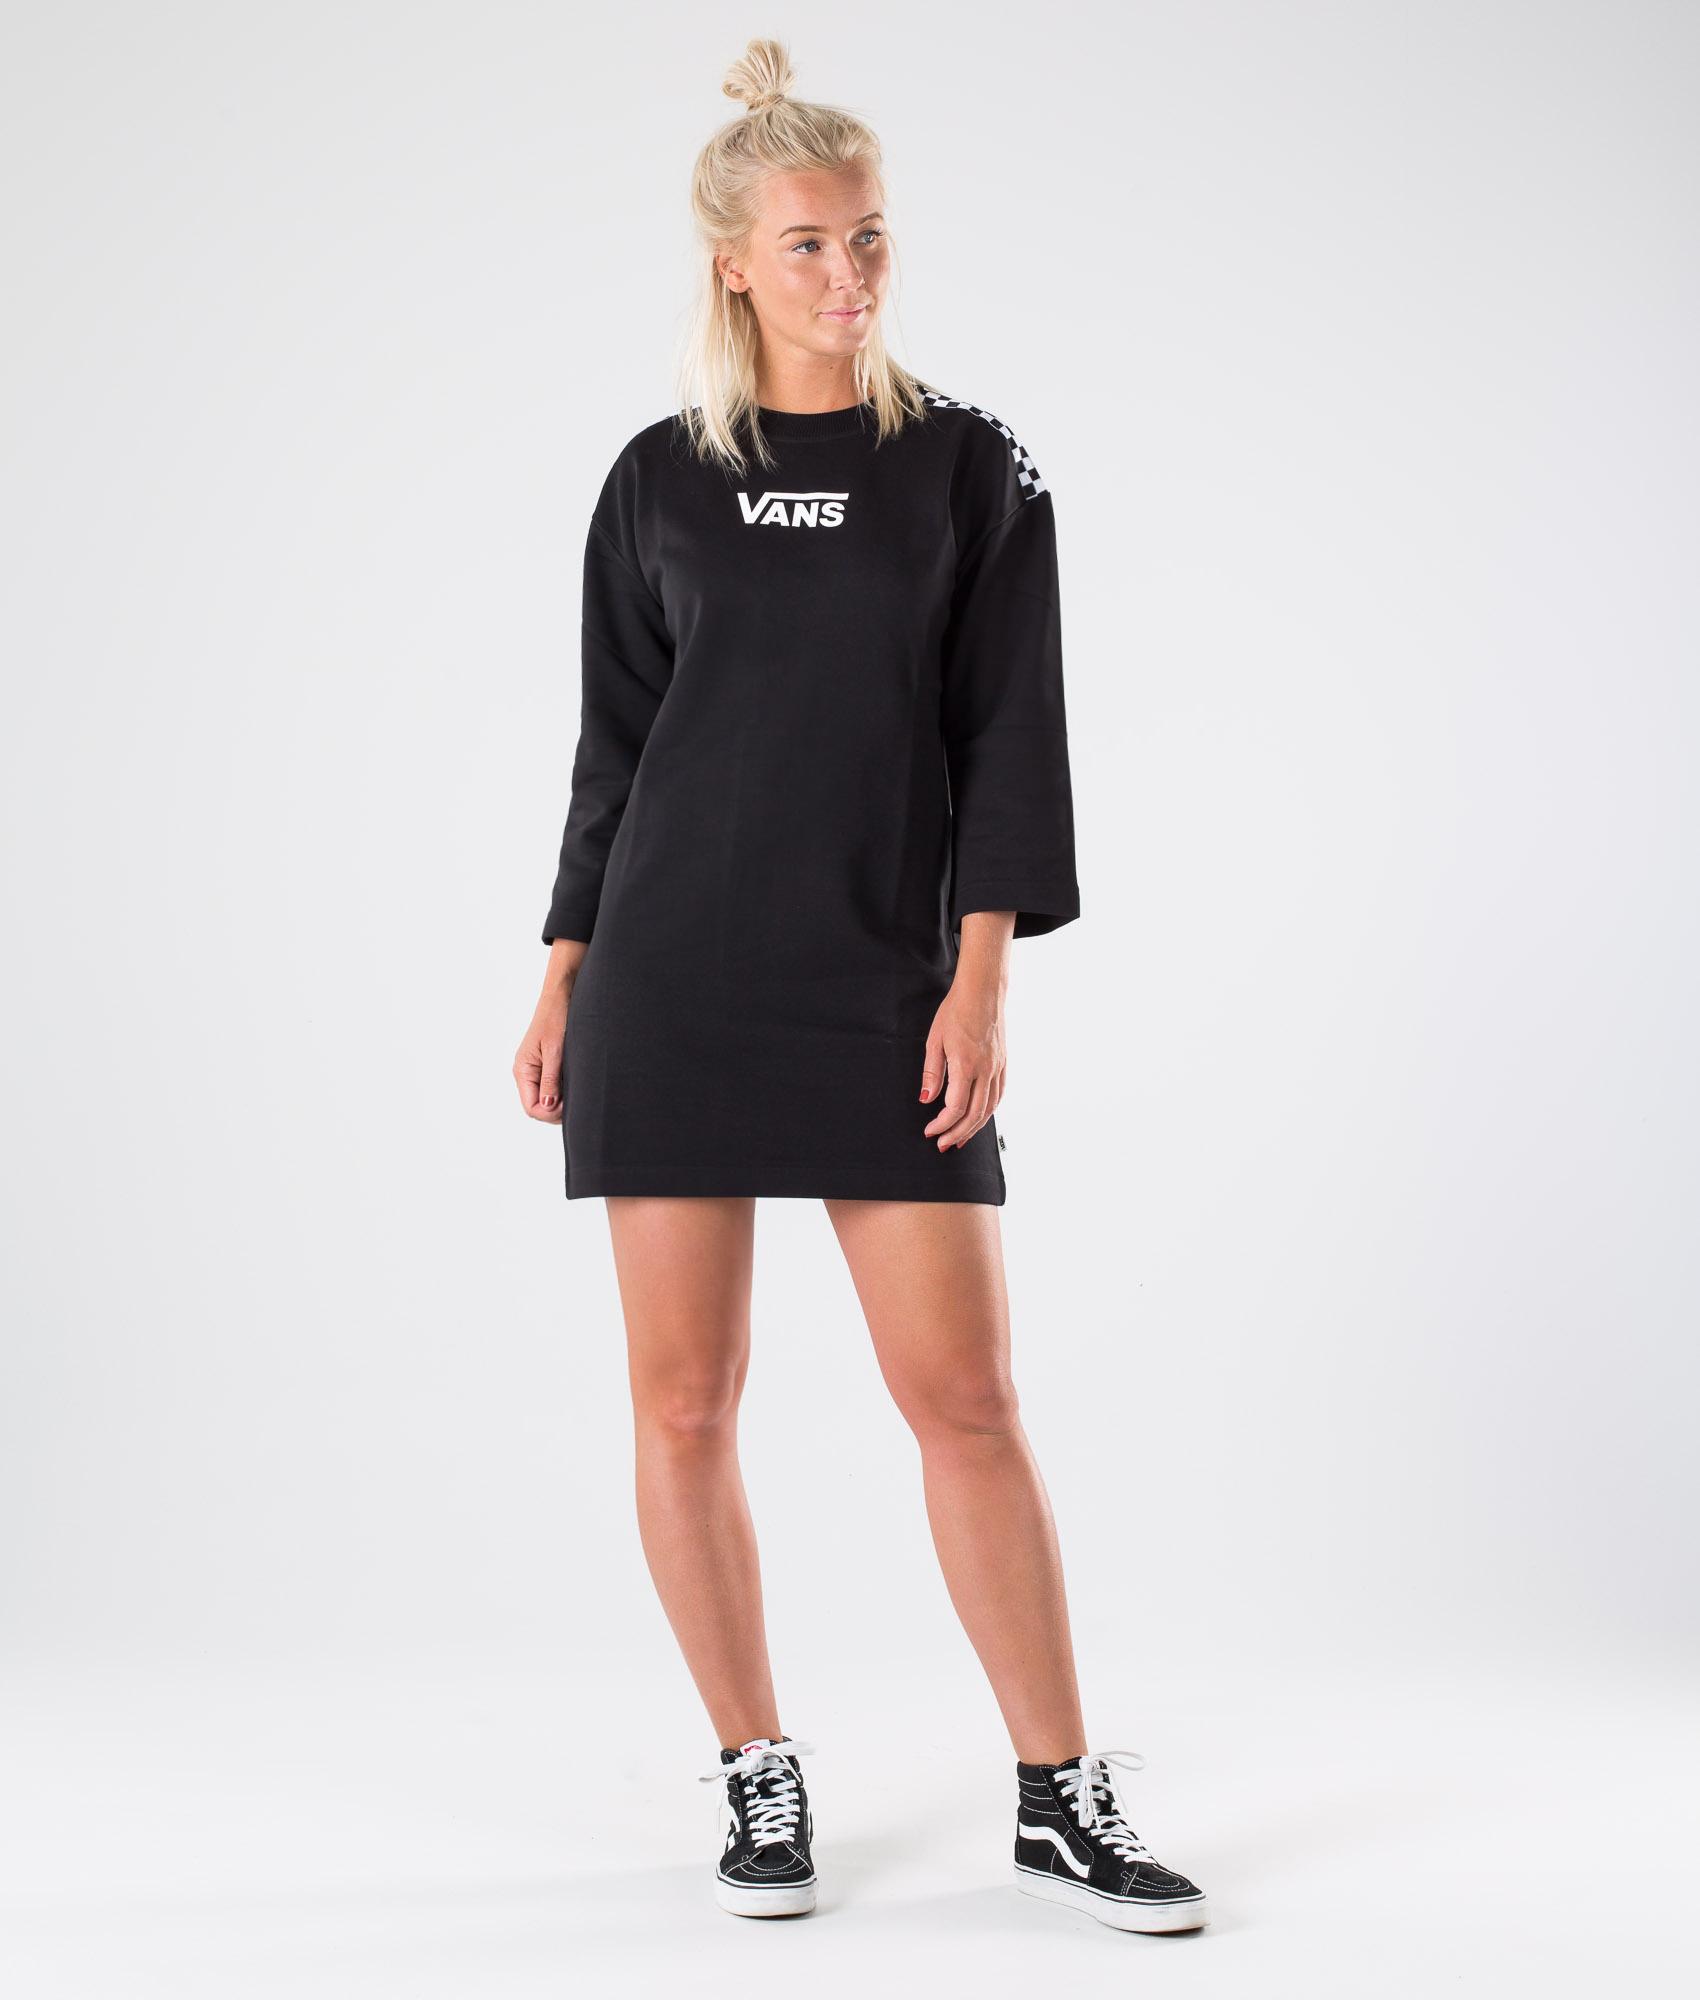 Vans Chromo II Dress Dress Black   Ridestore.com